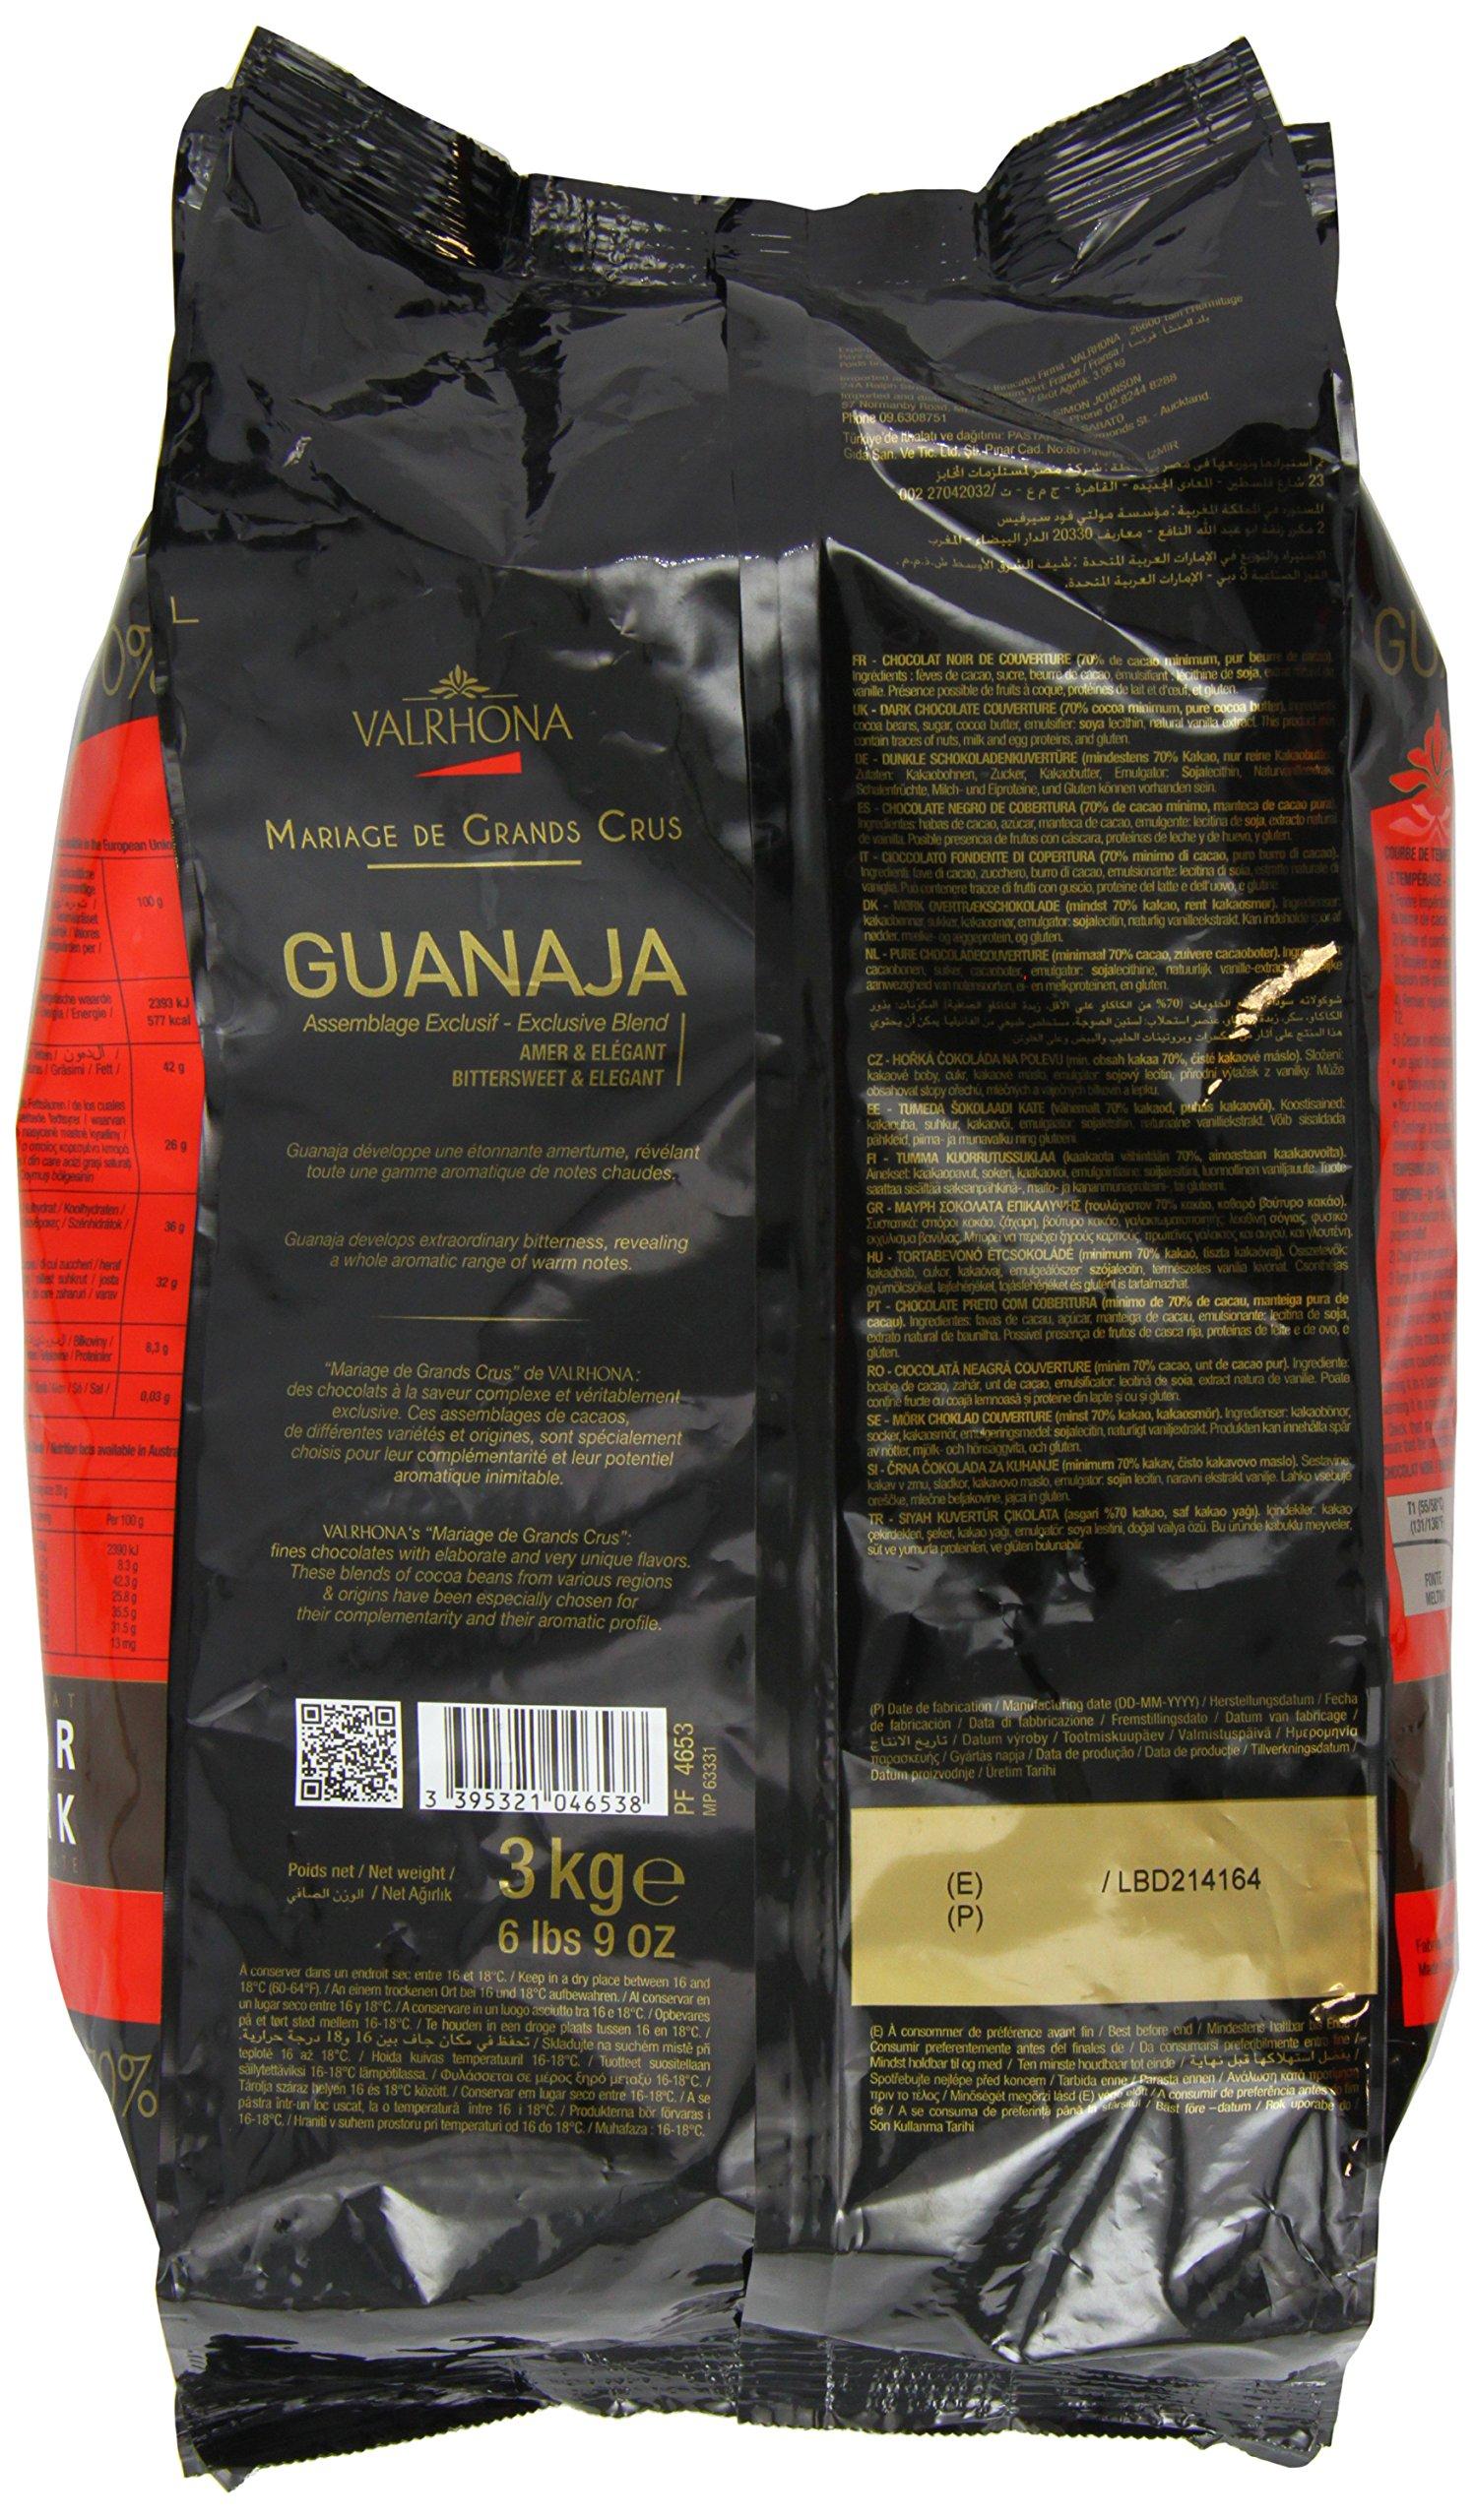 Valrhona Dark Chocolate - 70% Cacao - Guanaja - 6 lbs 9 oz bag of feves by Valrhona (Image #4)